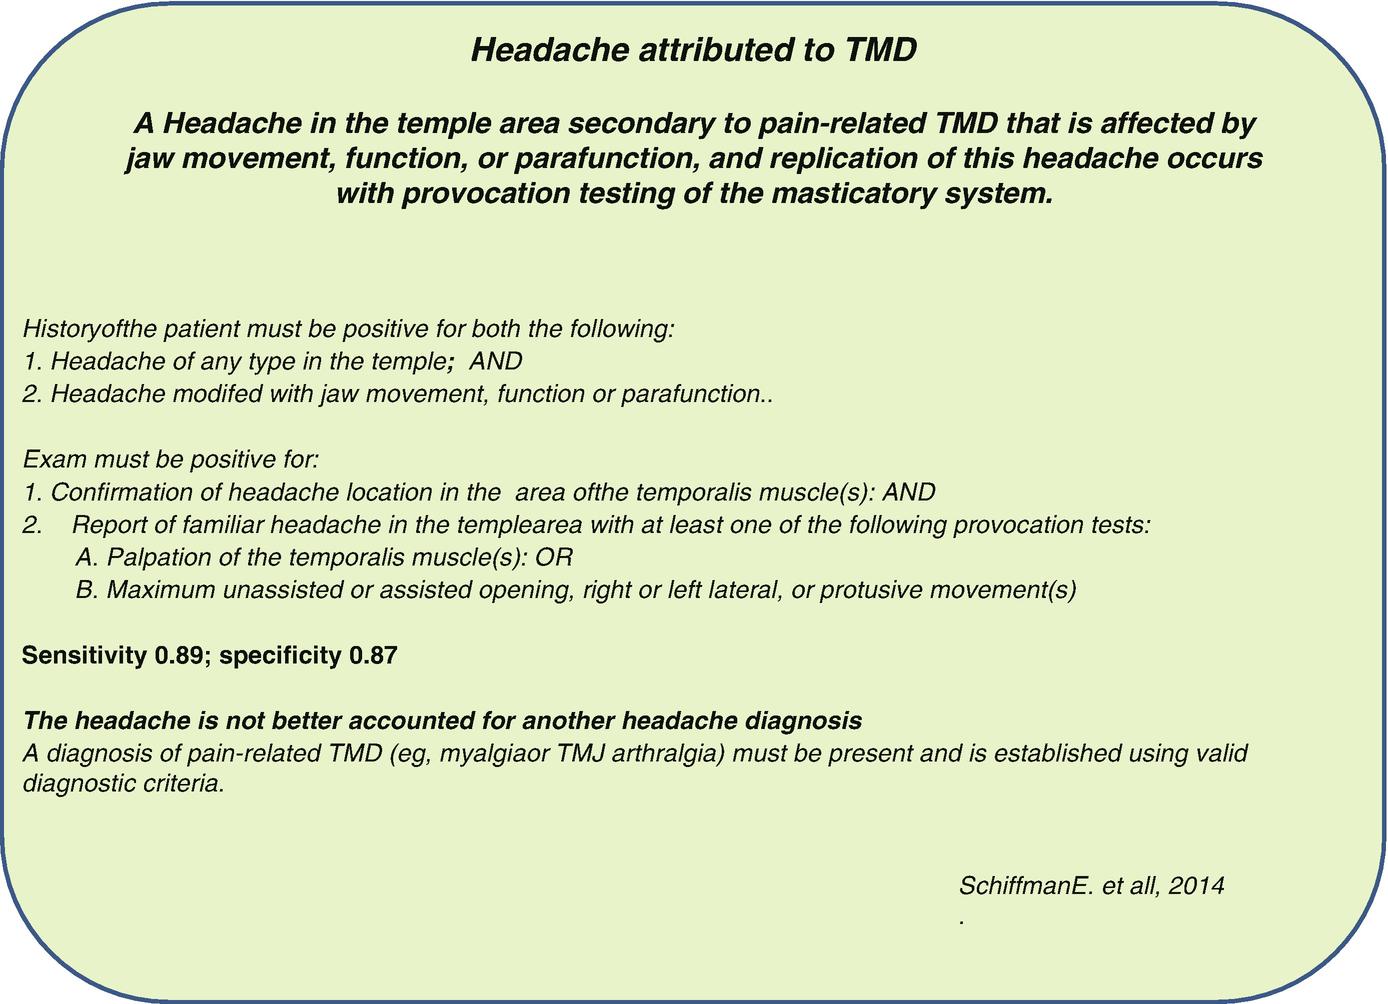 Diagnosis of Temporomandibular Disorders Using DC/TMD Criteria